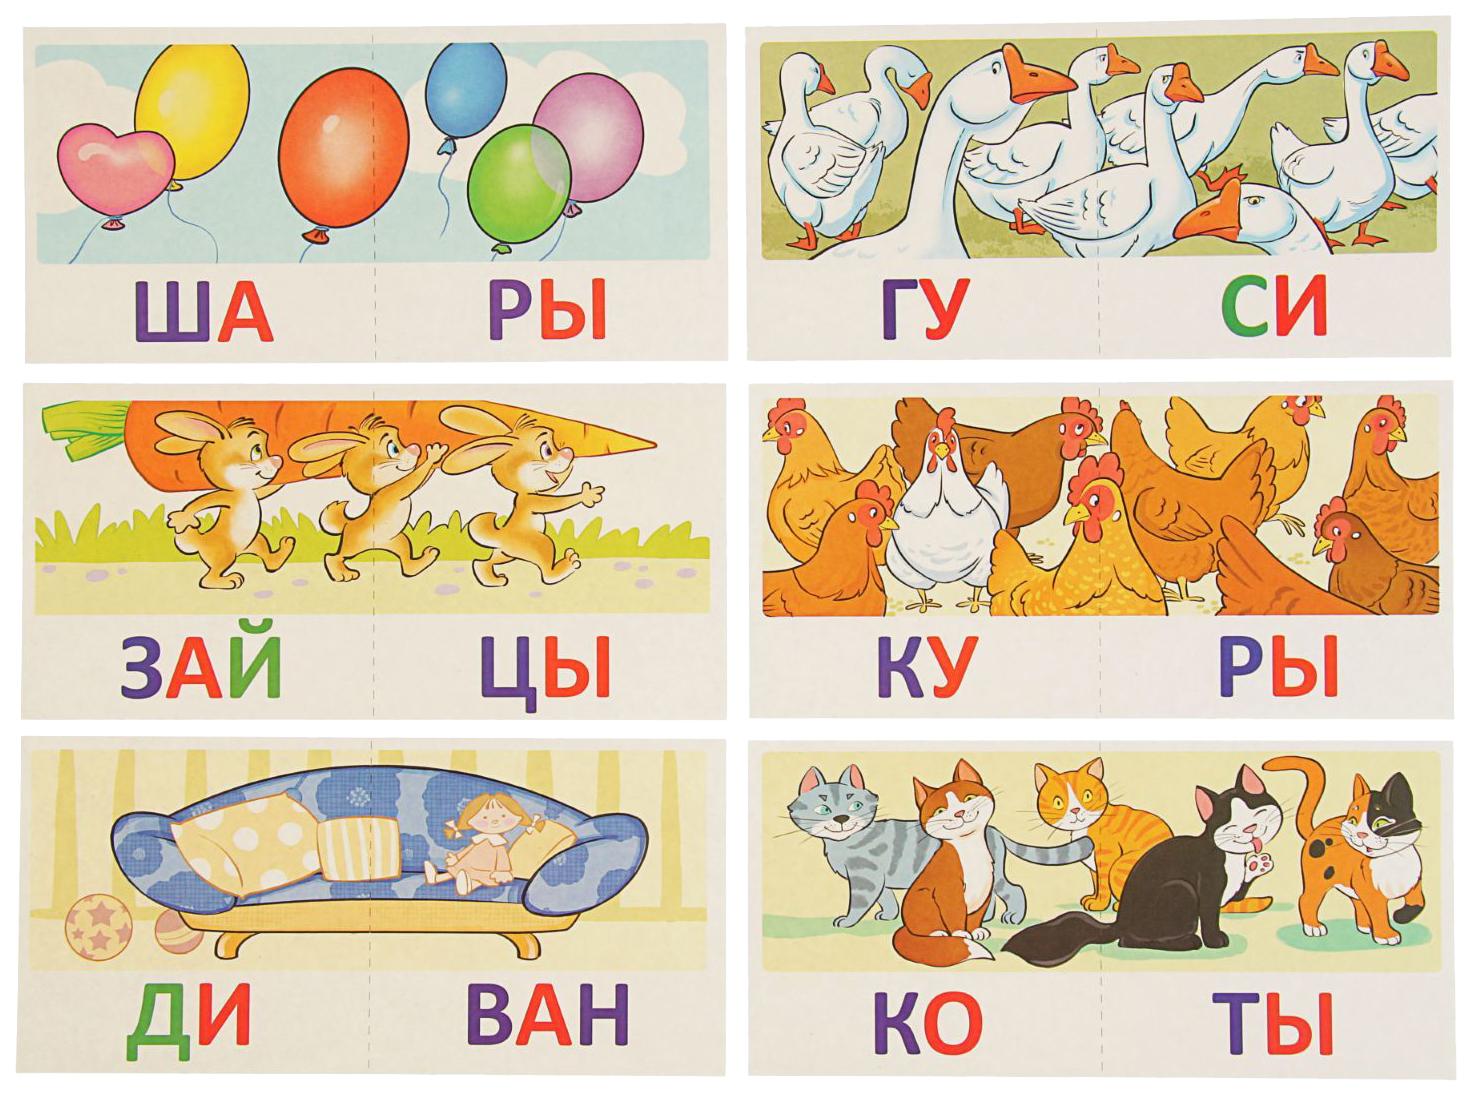 Картинки по слогам